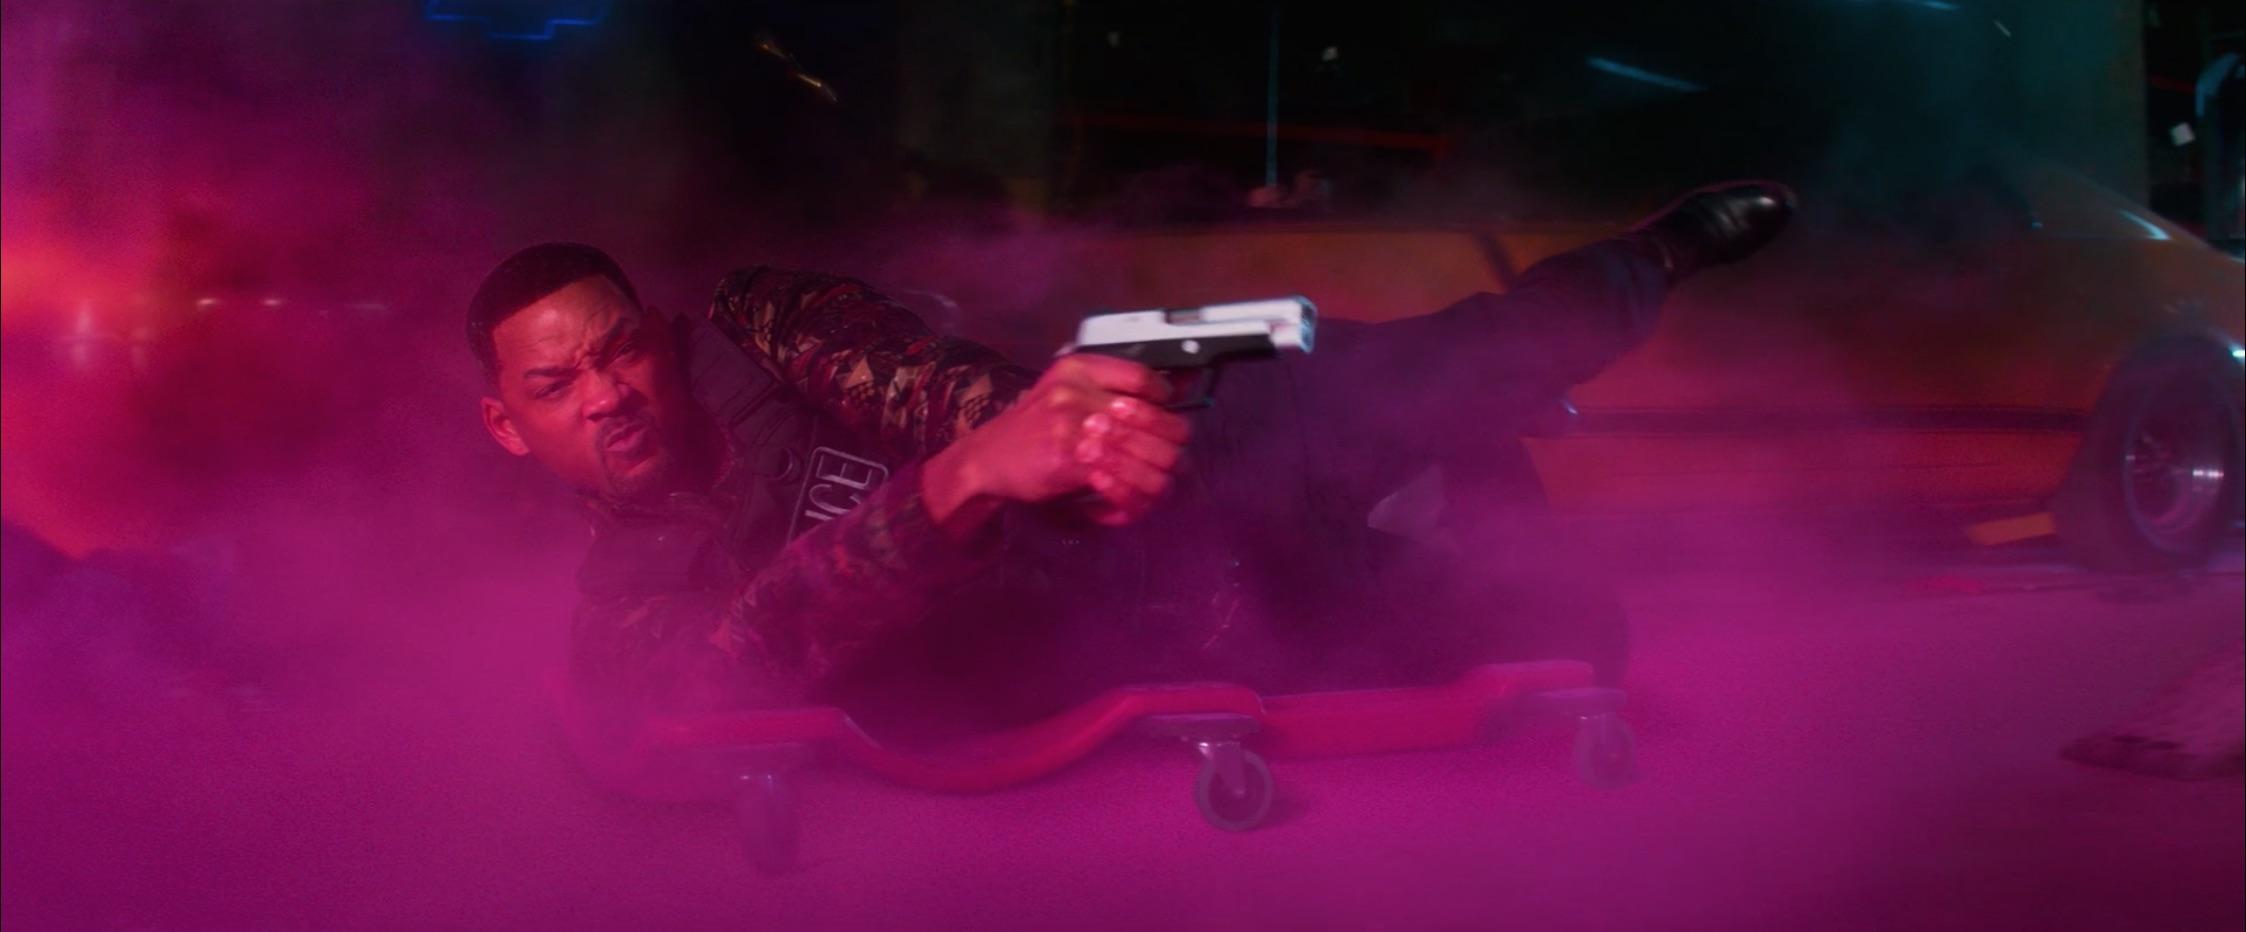 Bad Boys For Life will smith sliding on creeper gun drawn